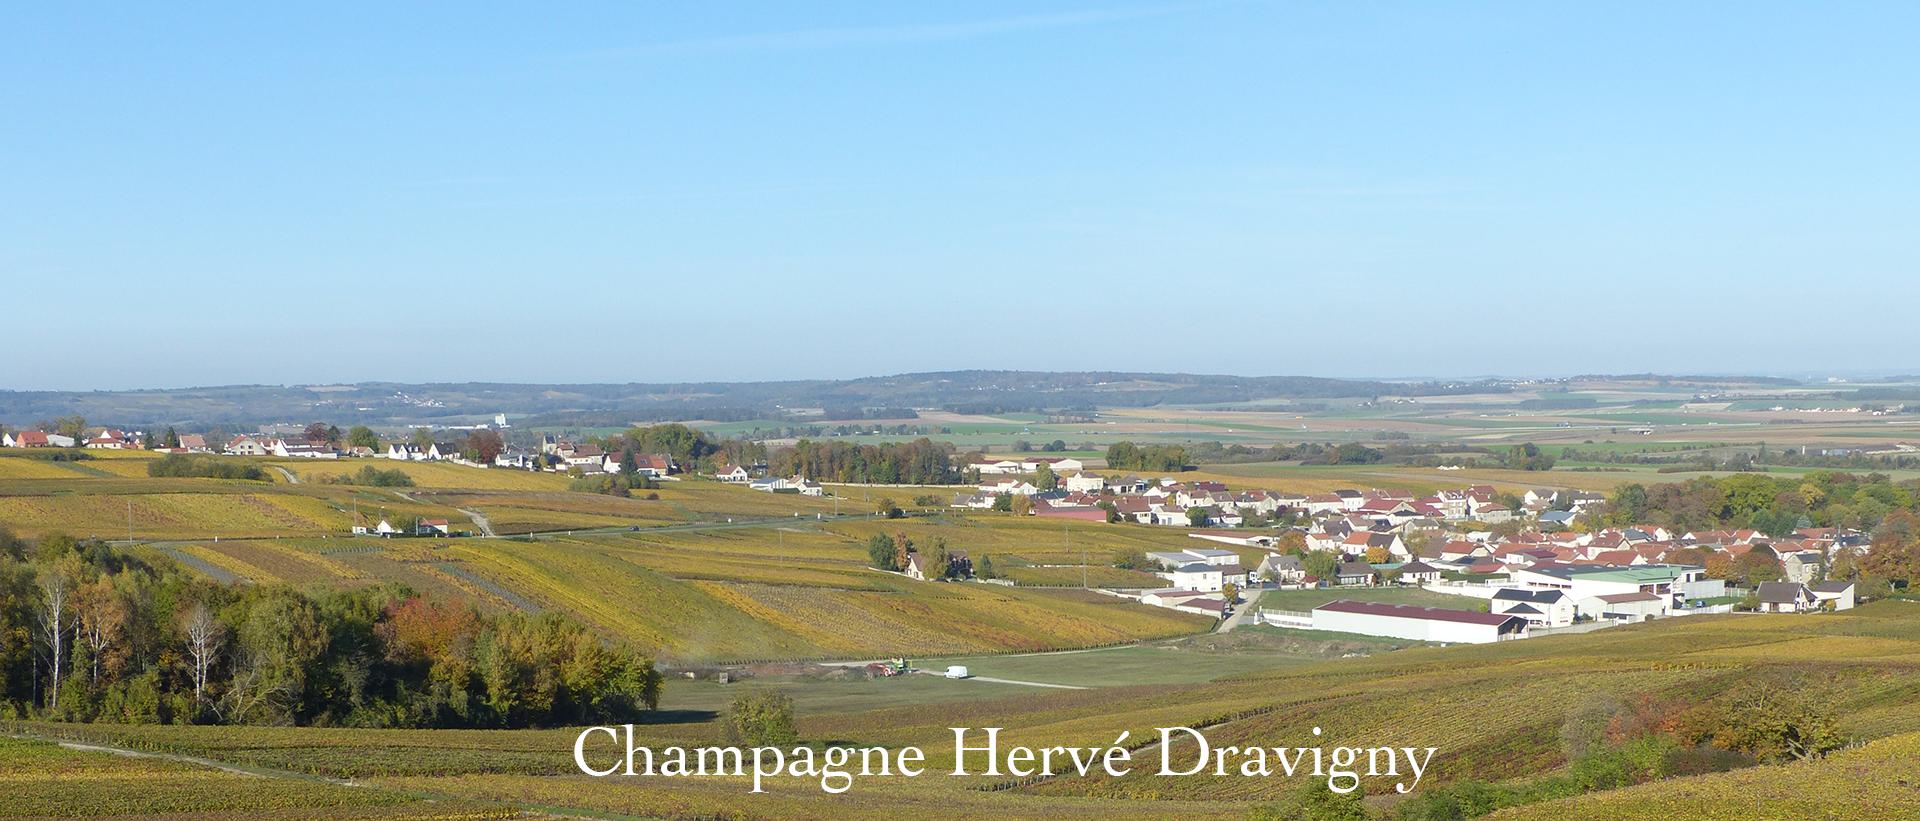 Champagne Hervé Dravigny